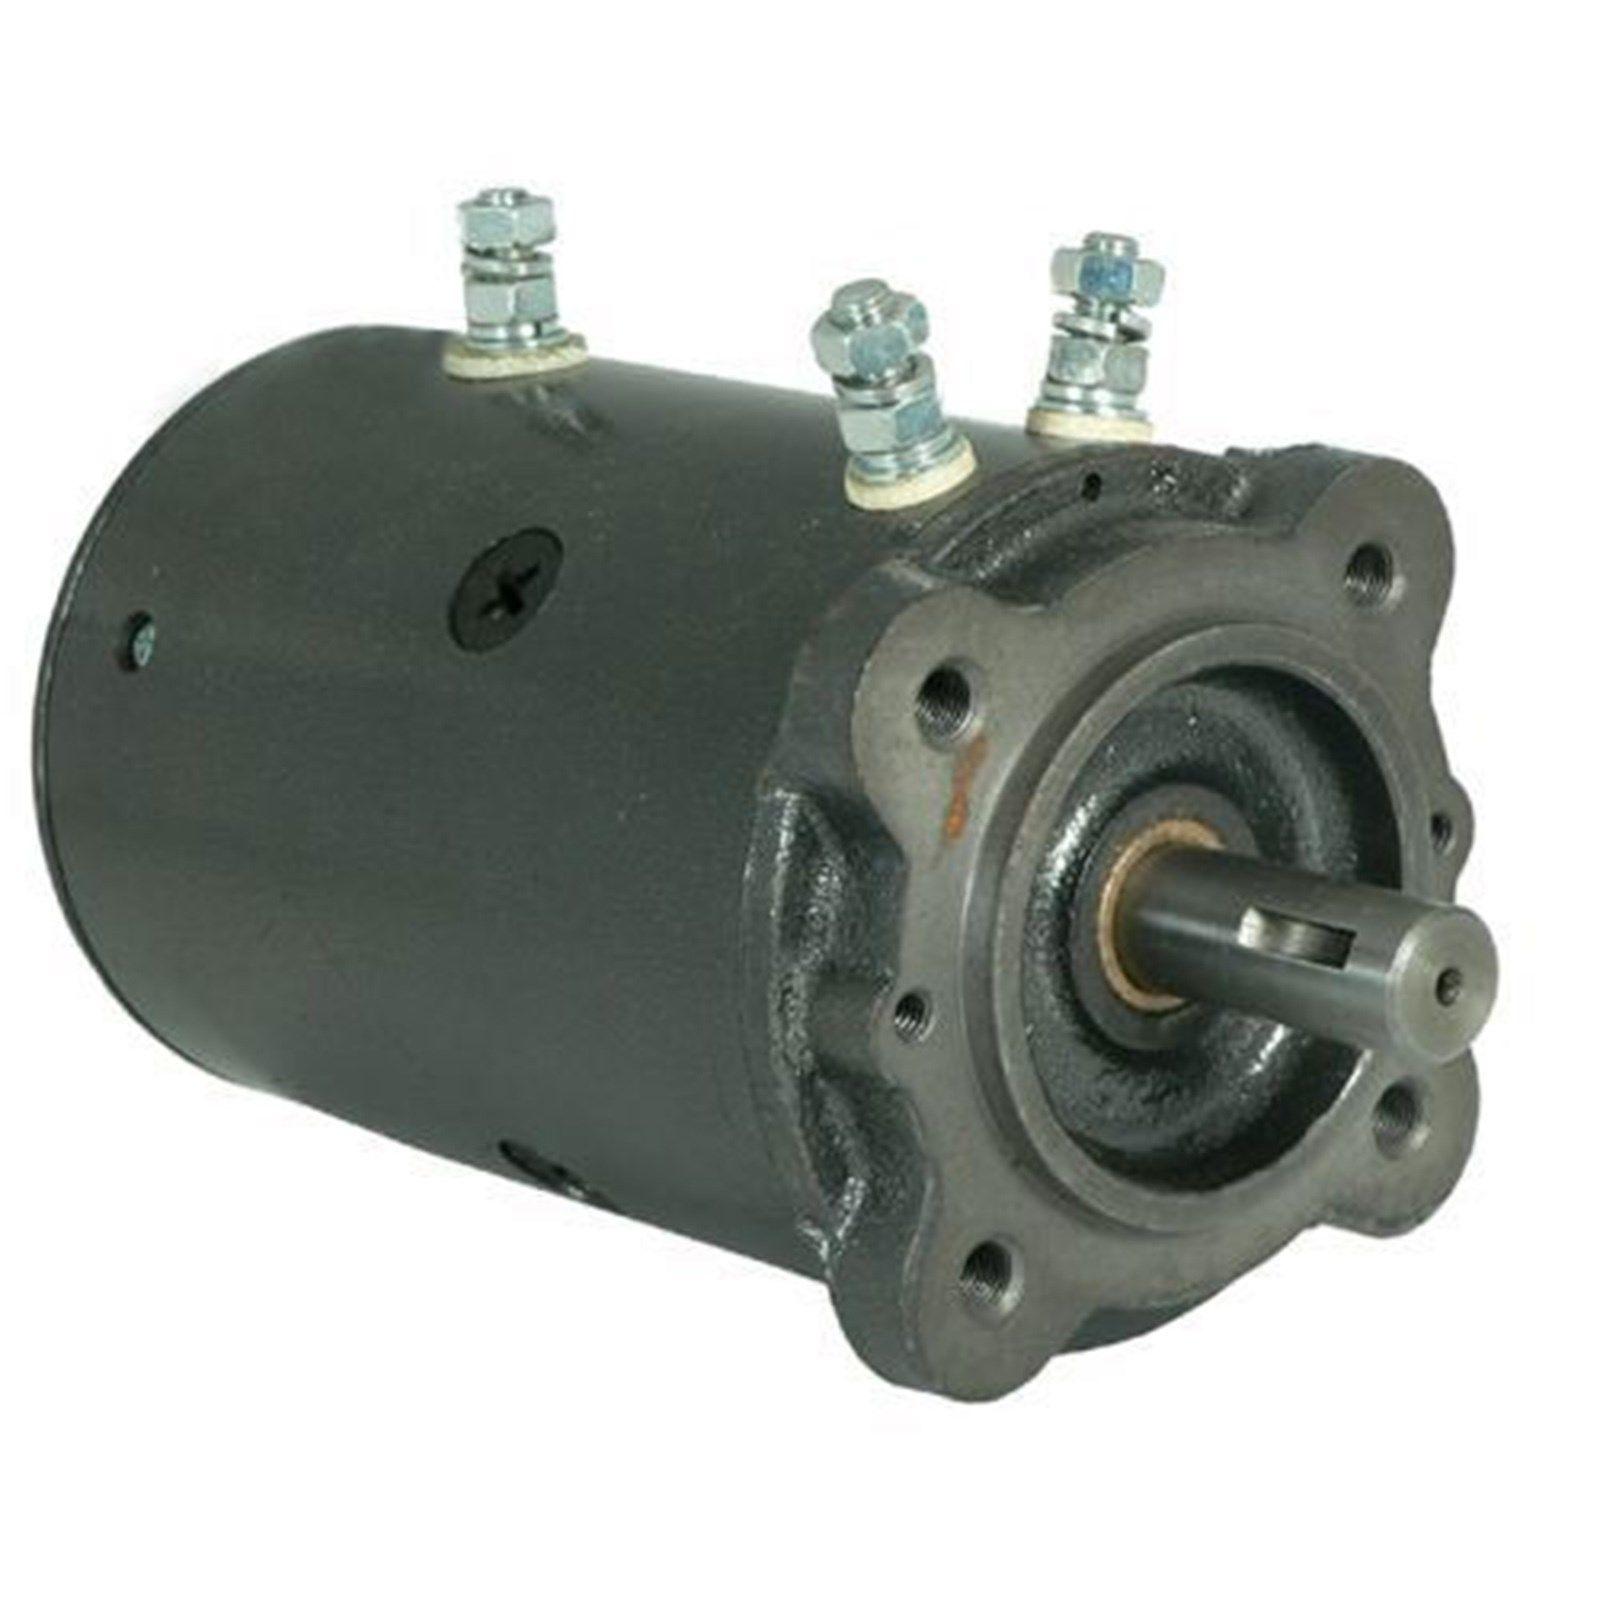 Winch Motor 24v Ramsey 458002 458005 Mmd4001 Mmd4401 46 2289 Wiring Diagram For Generator New 3523